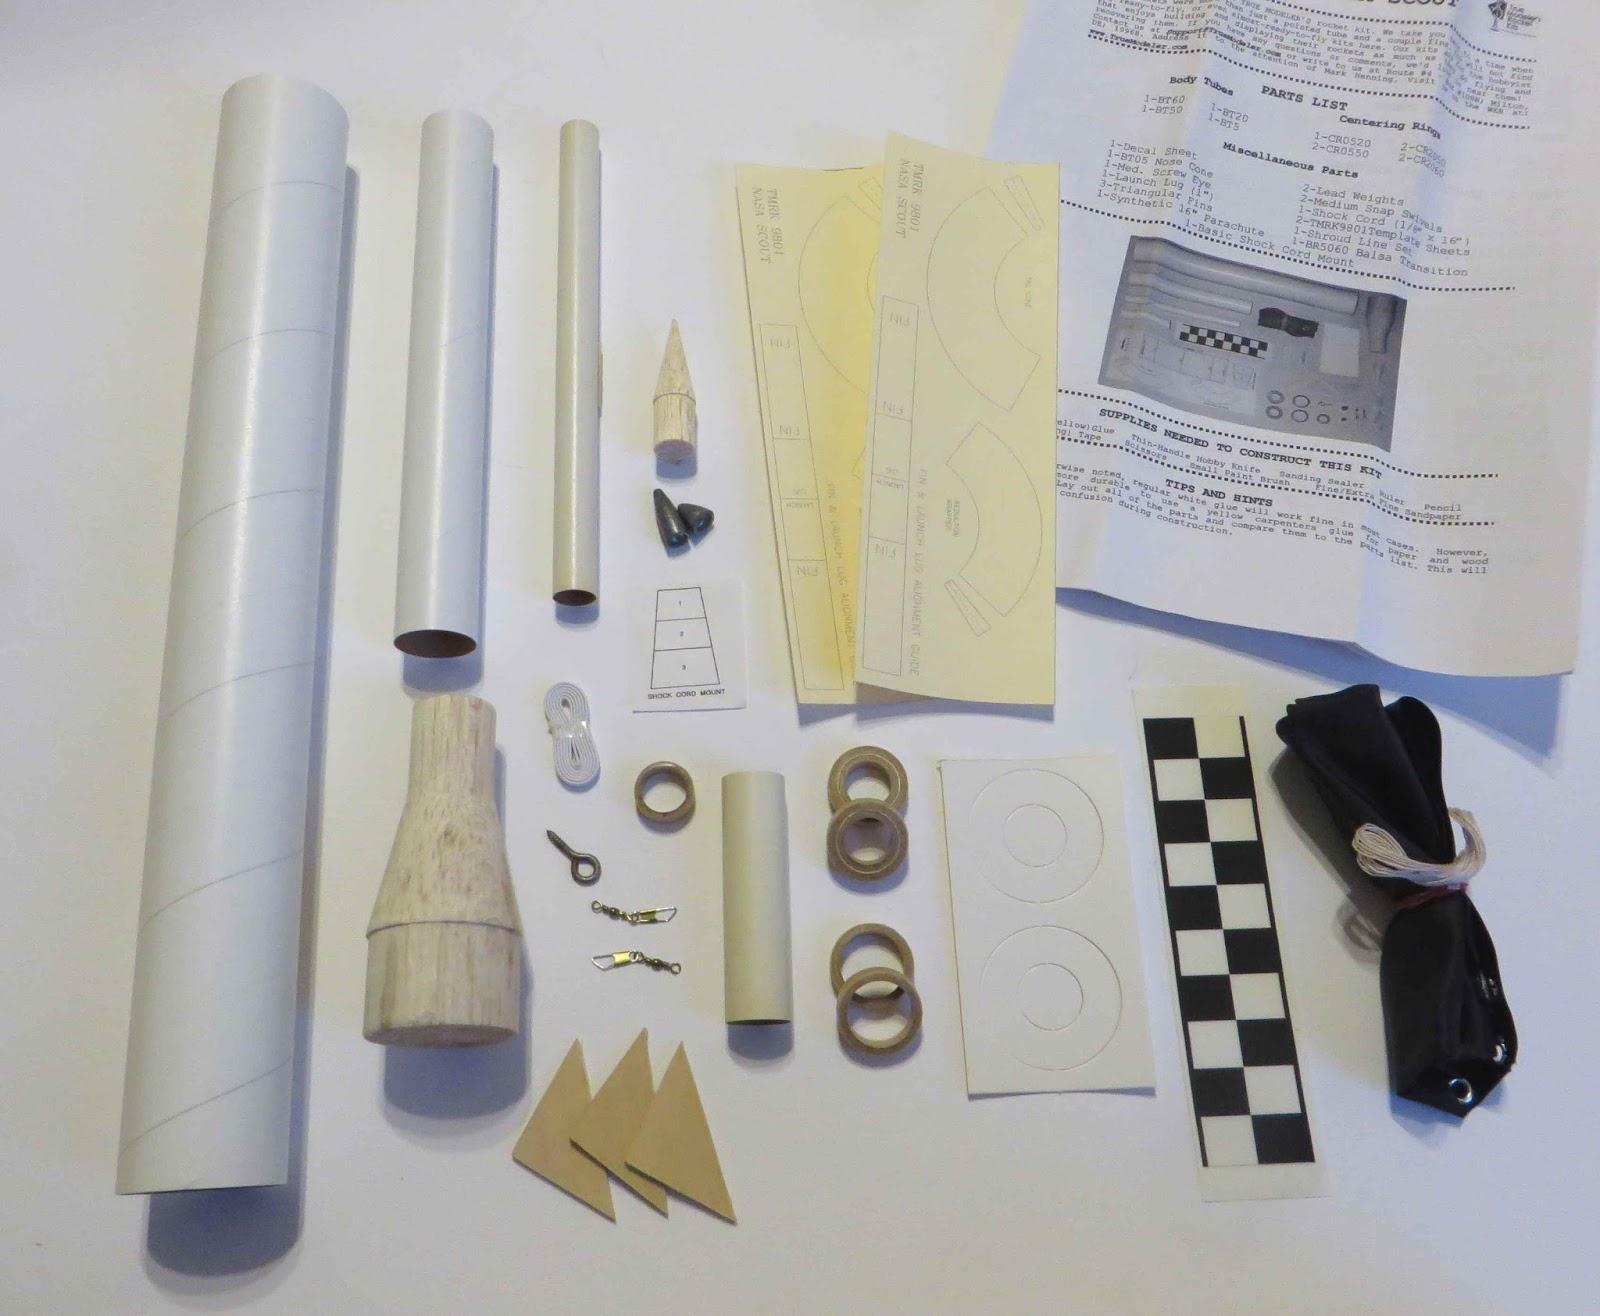 nasa model rocket kits - photo #41